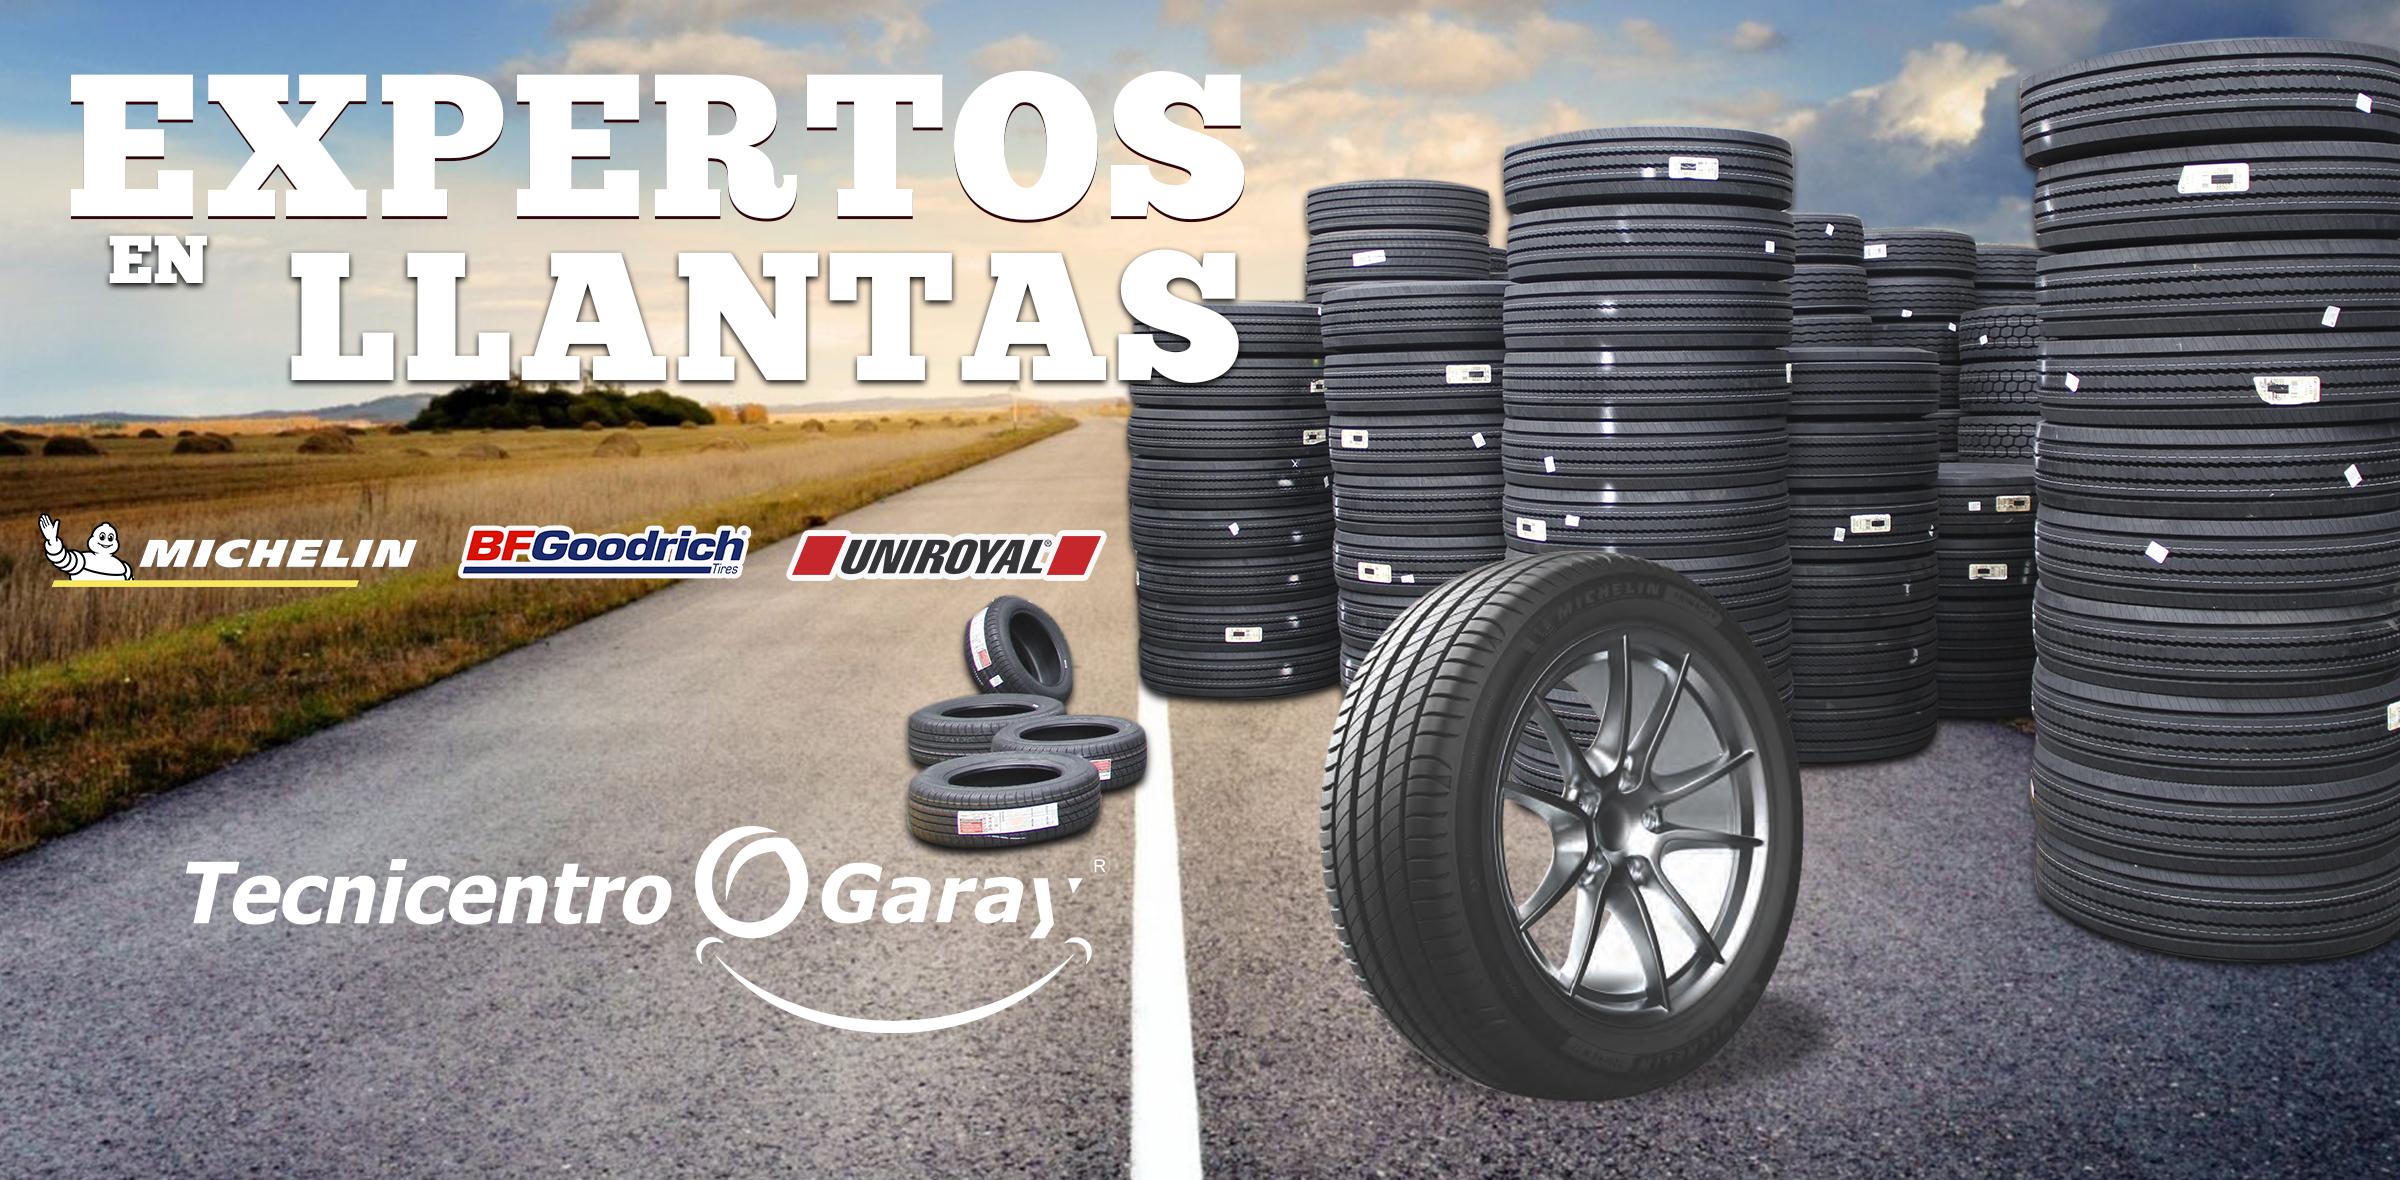 BANNER PRINCIPAL PAGINA WEB GRUPO GARA EXPERTOS EN LLANTAS